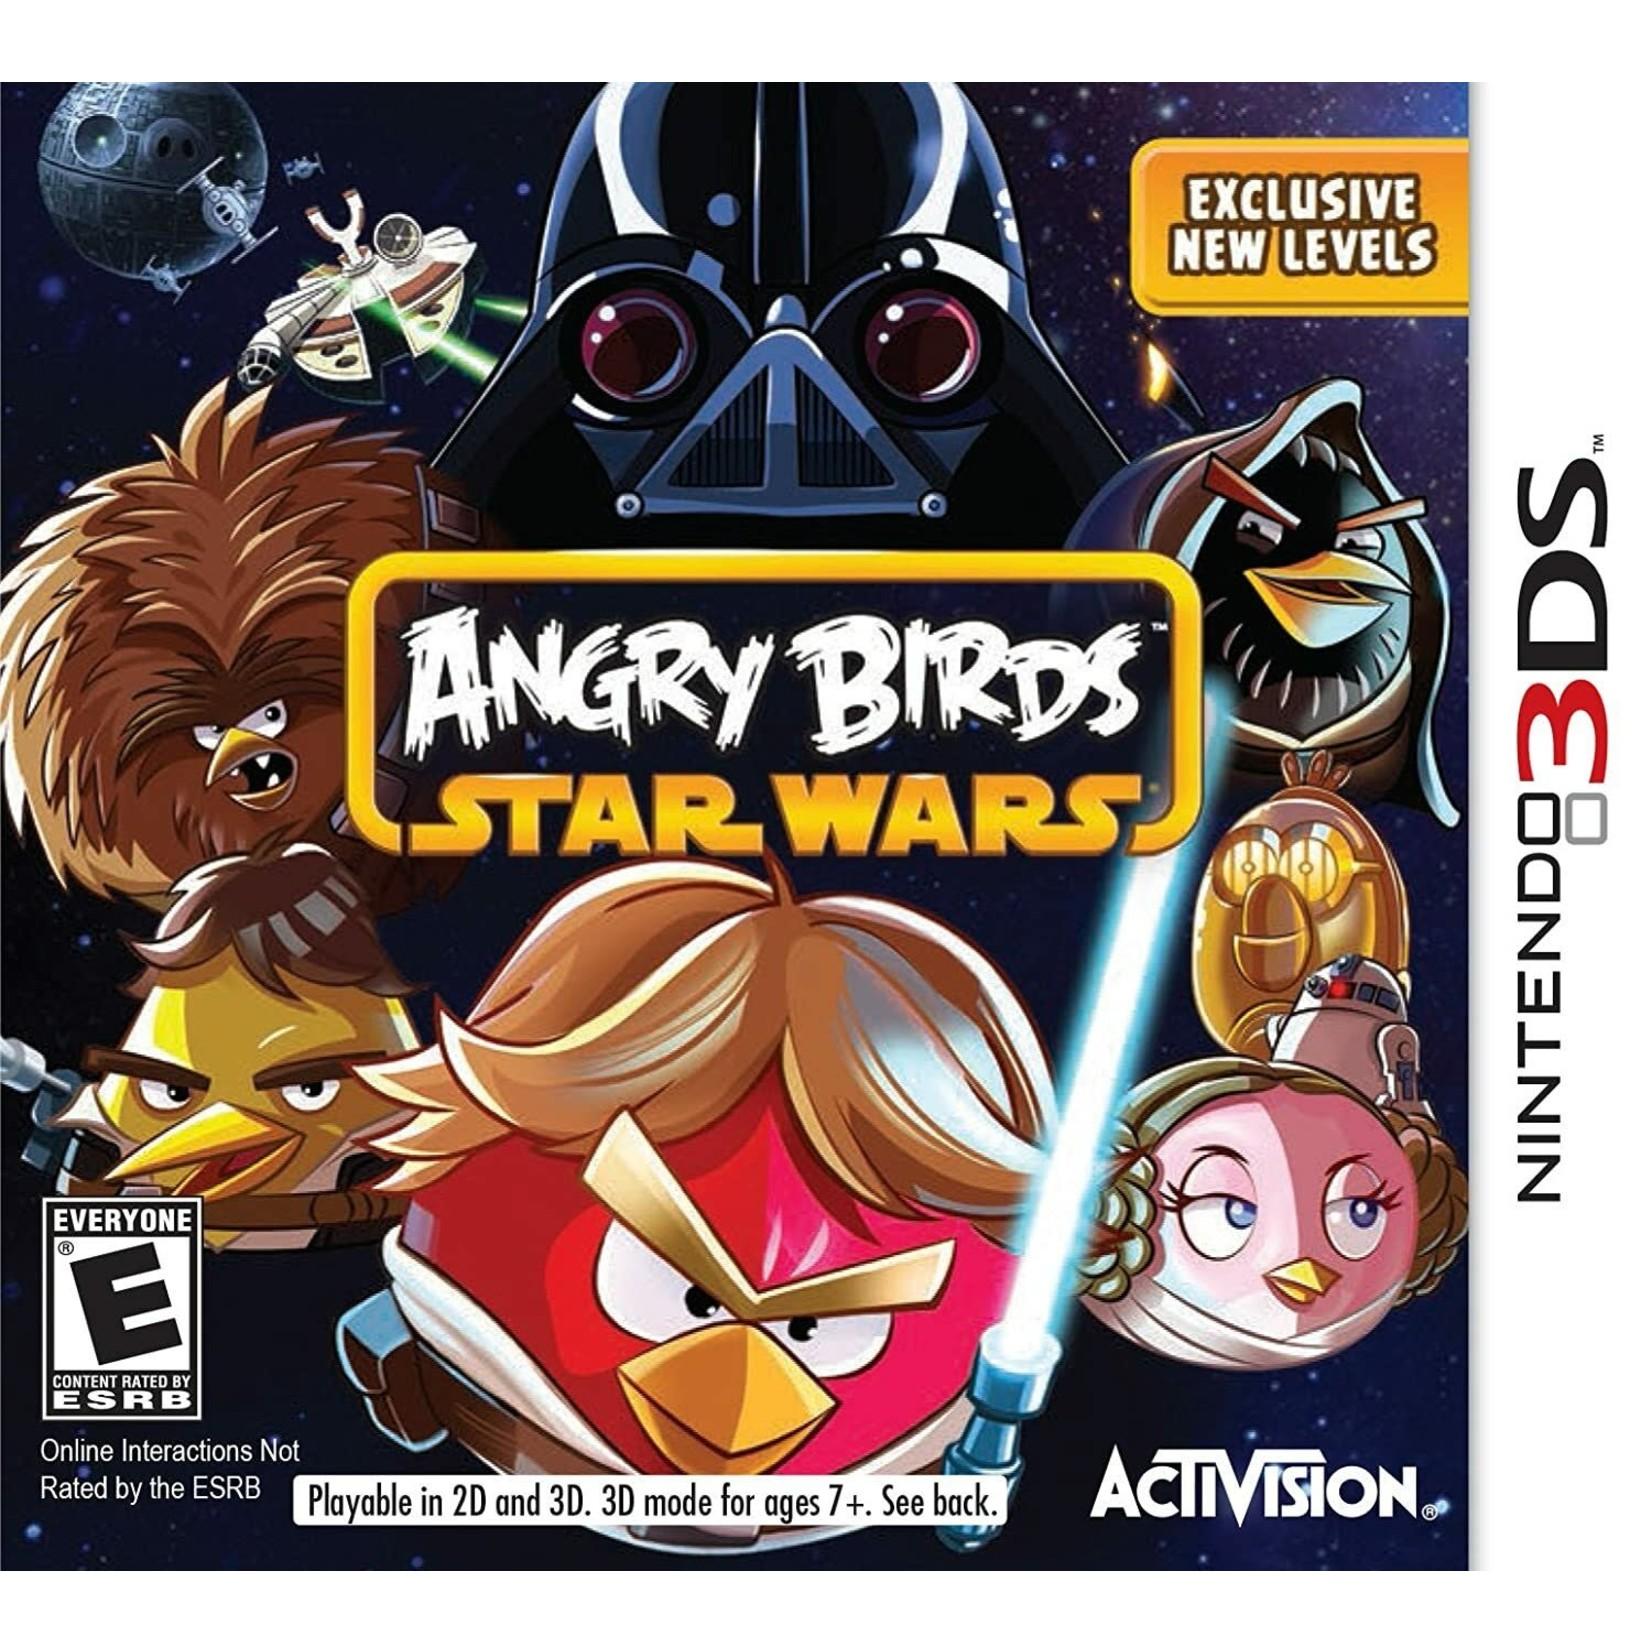 3DSU-Angry Birds: Star Wars